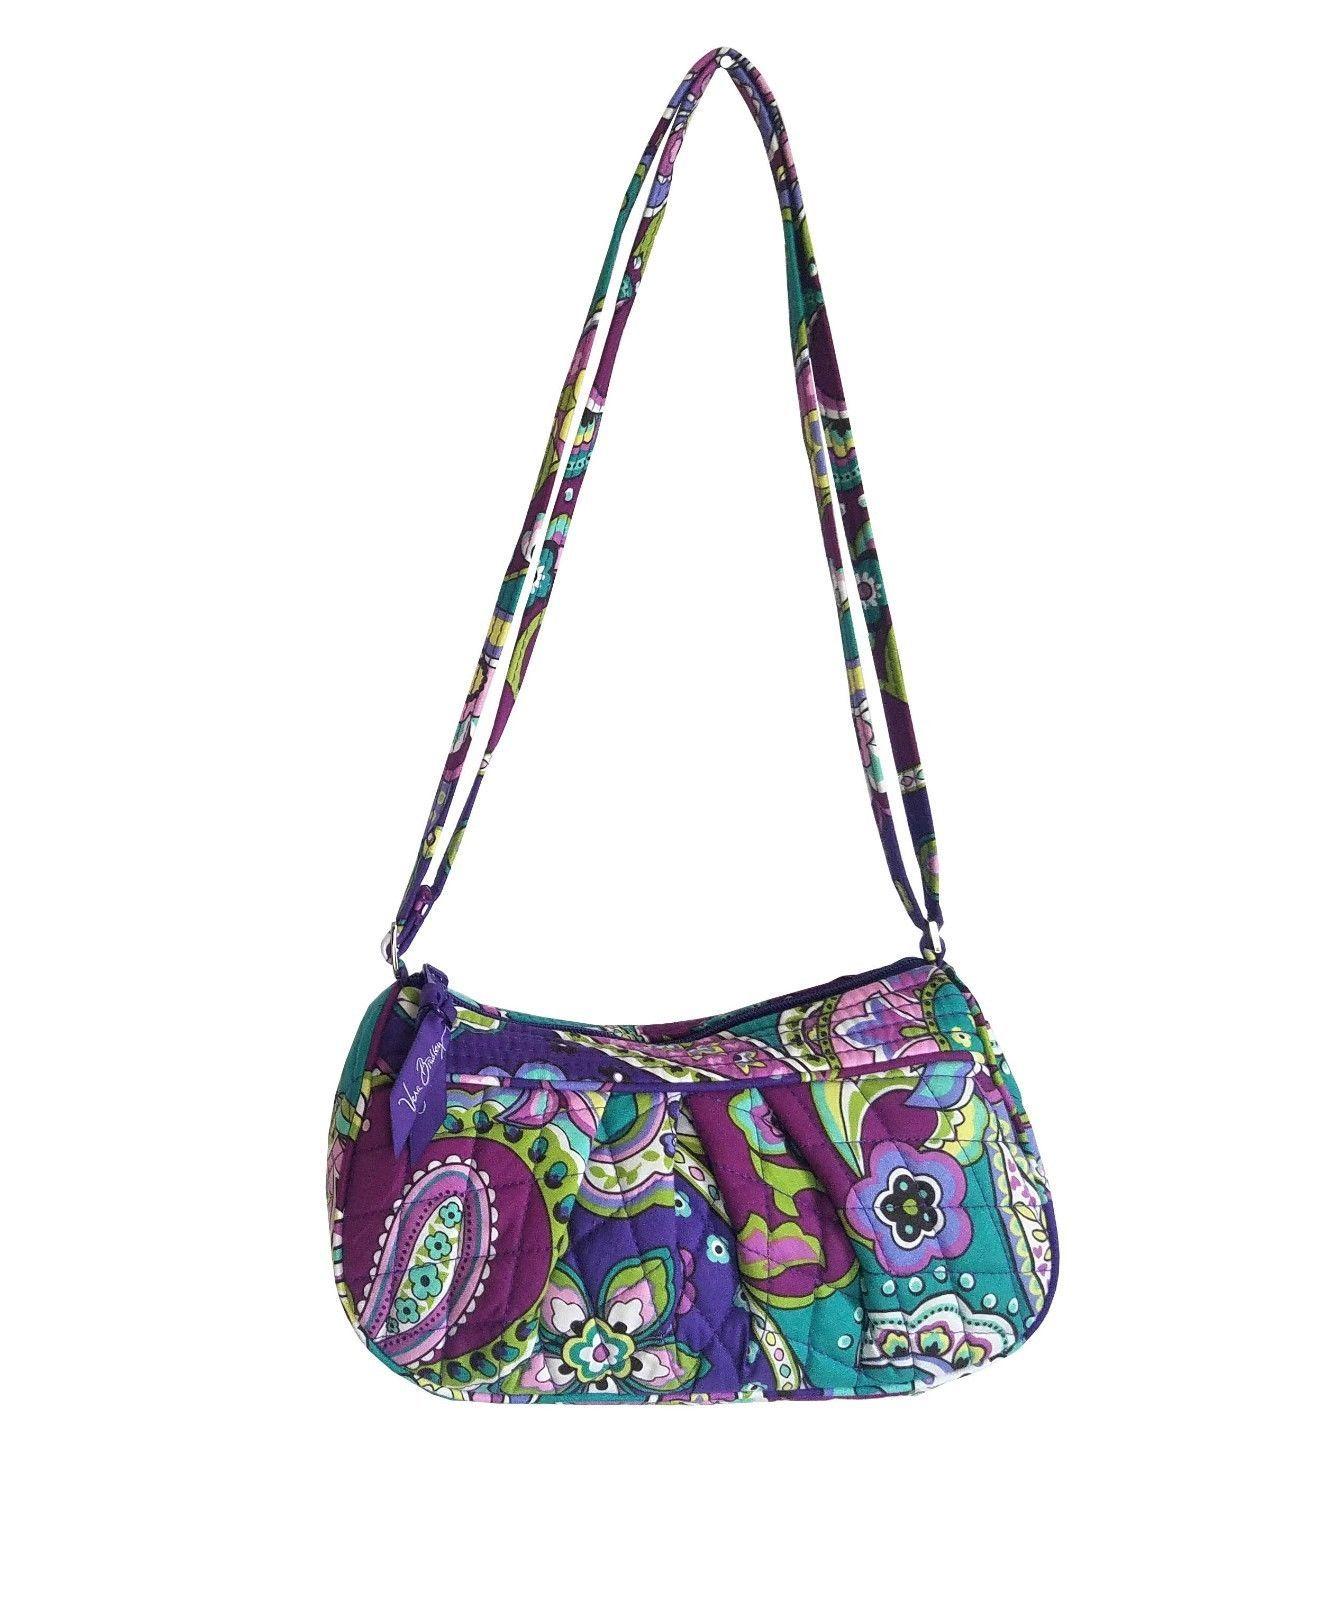 fa7f6d3bd7 Vera Bradley Frannie Crossbody Bag  Resale  Heather Pattern Shoulder Bag   stellasaksa